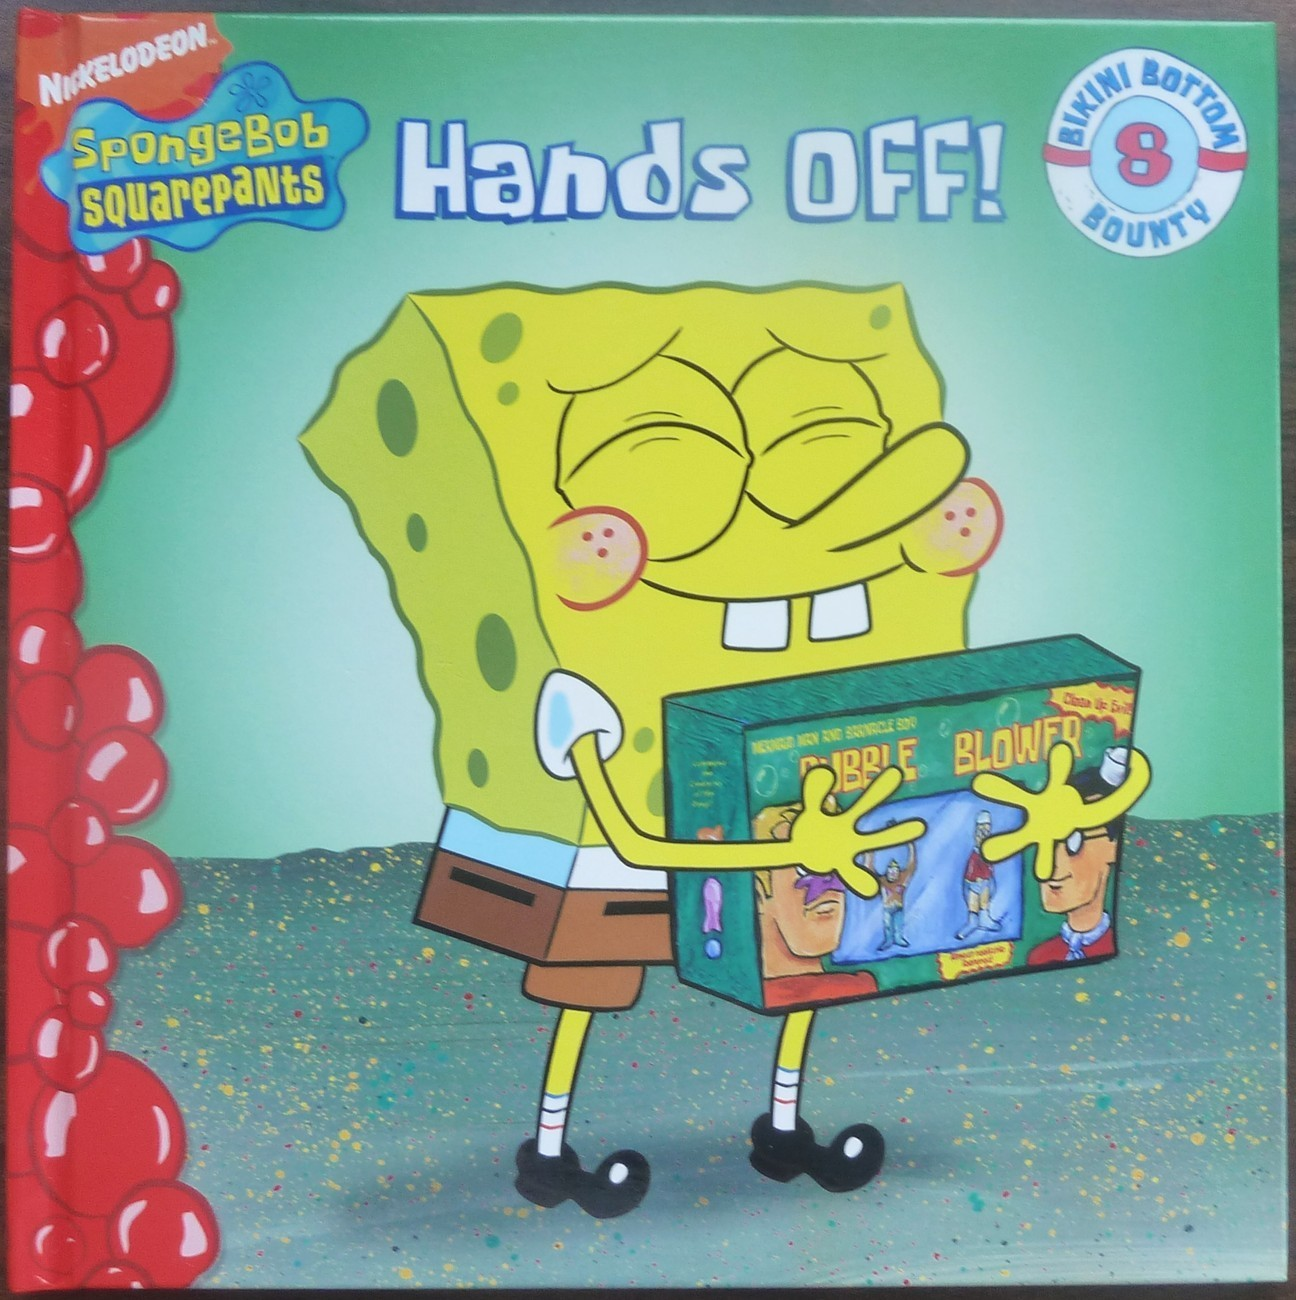 SpongeBob Squarepants Hands Off by David Lewman